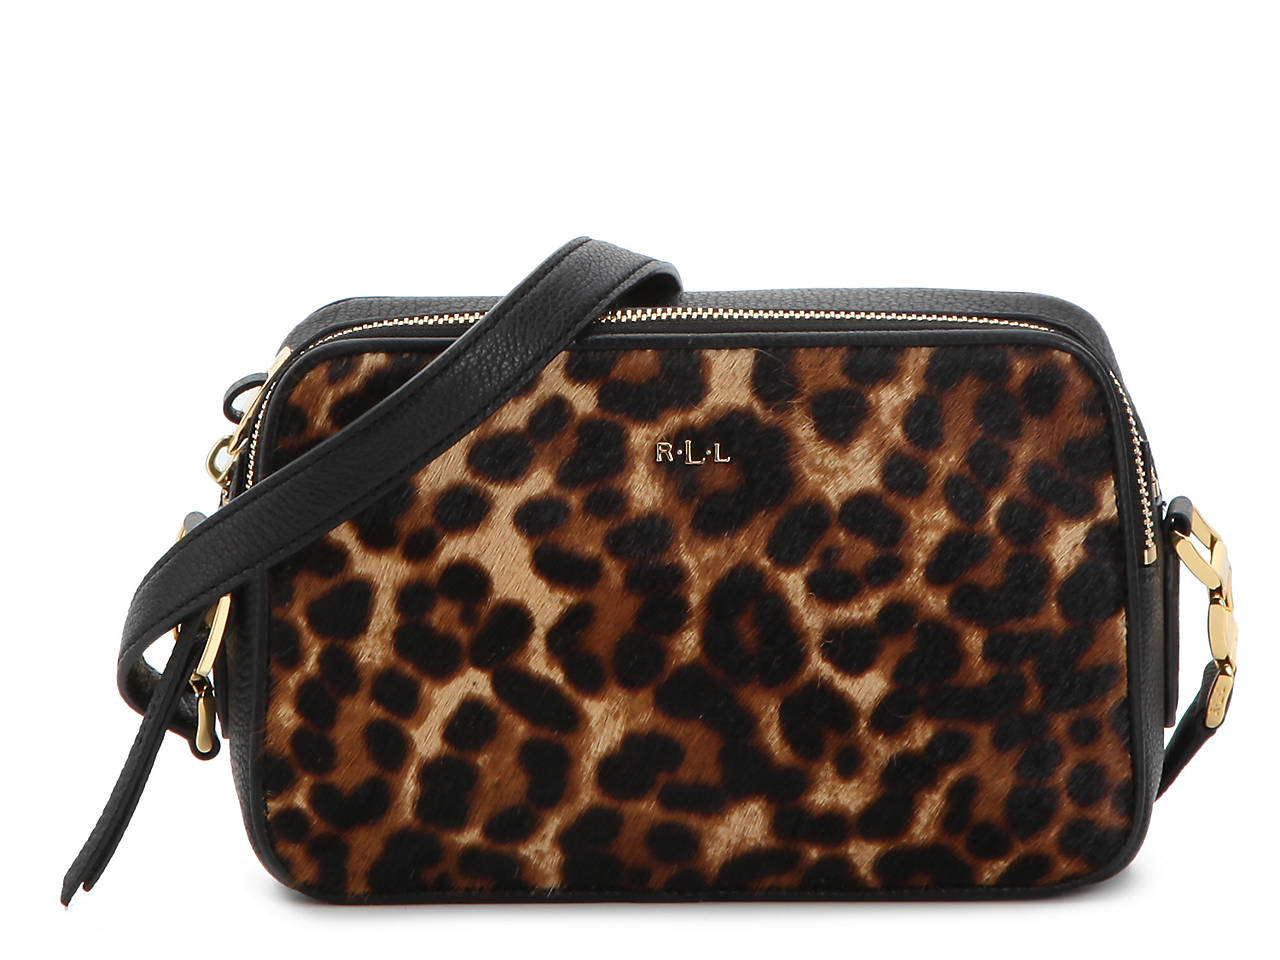 Rawson Celeste Leather Crossbody Bag